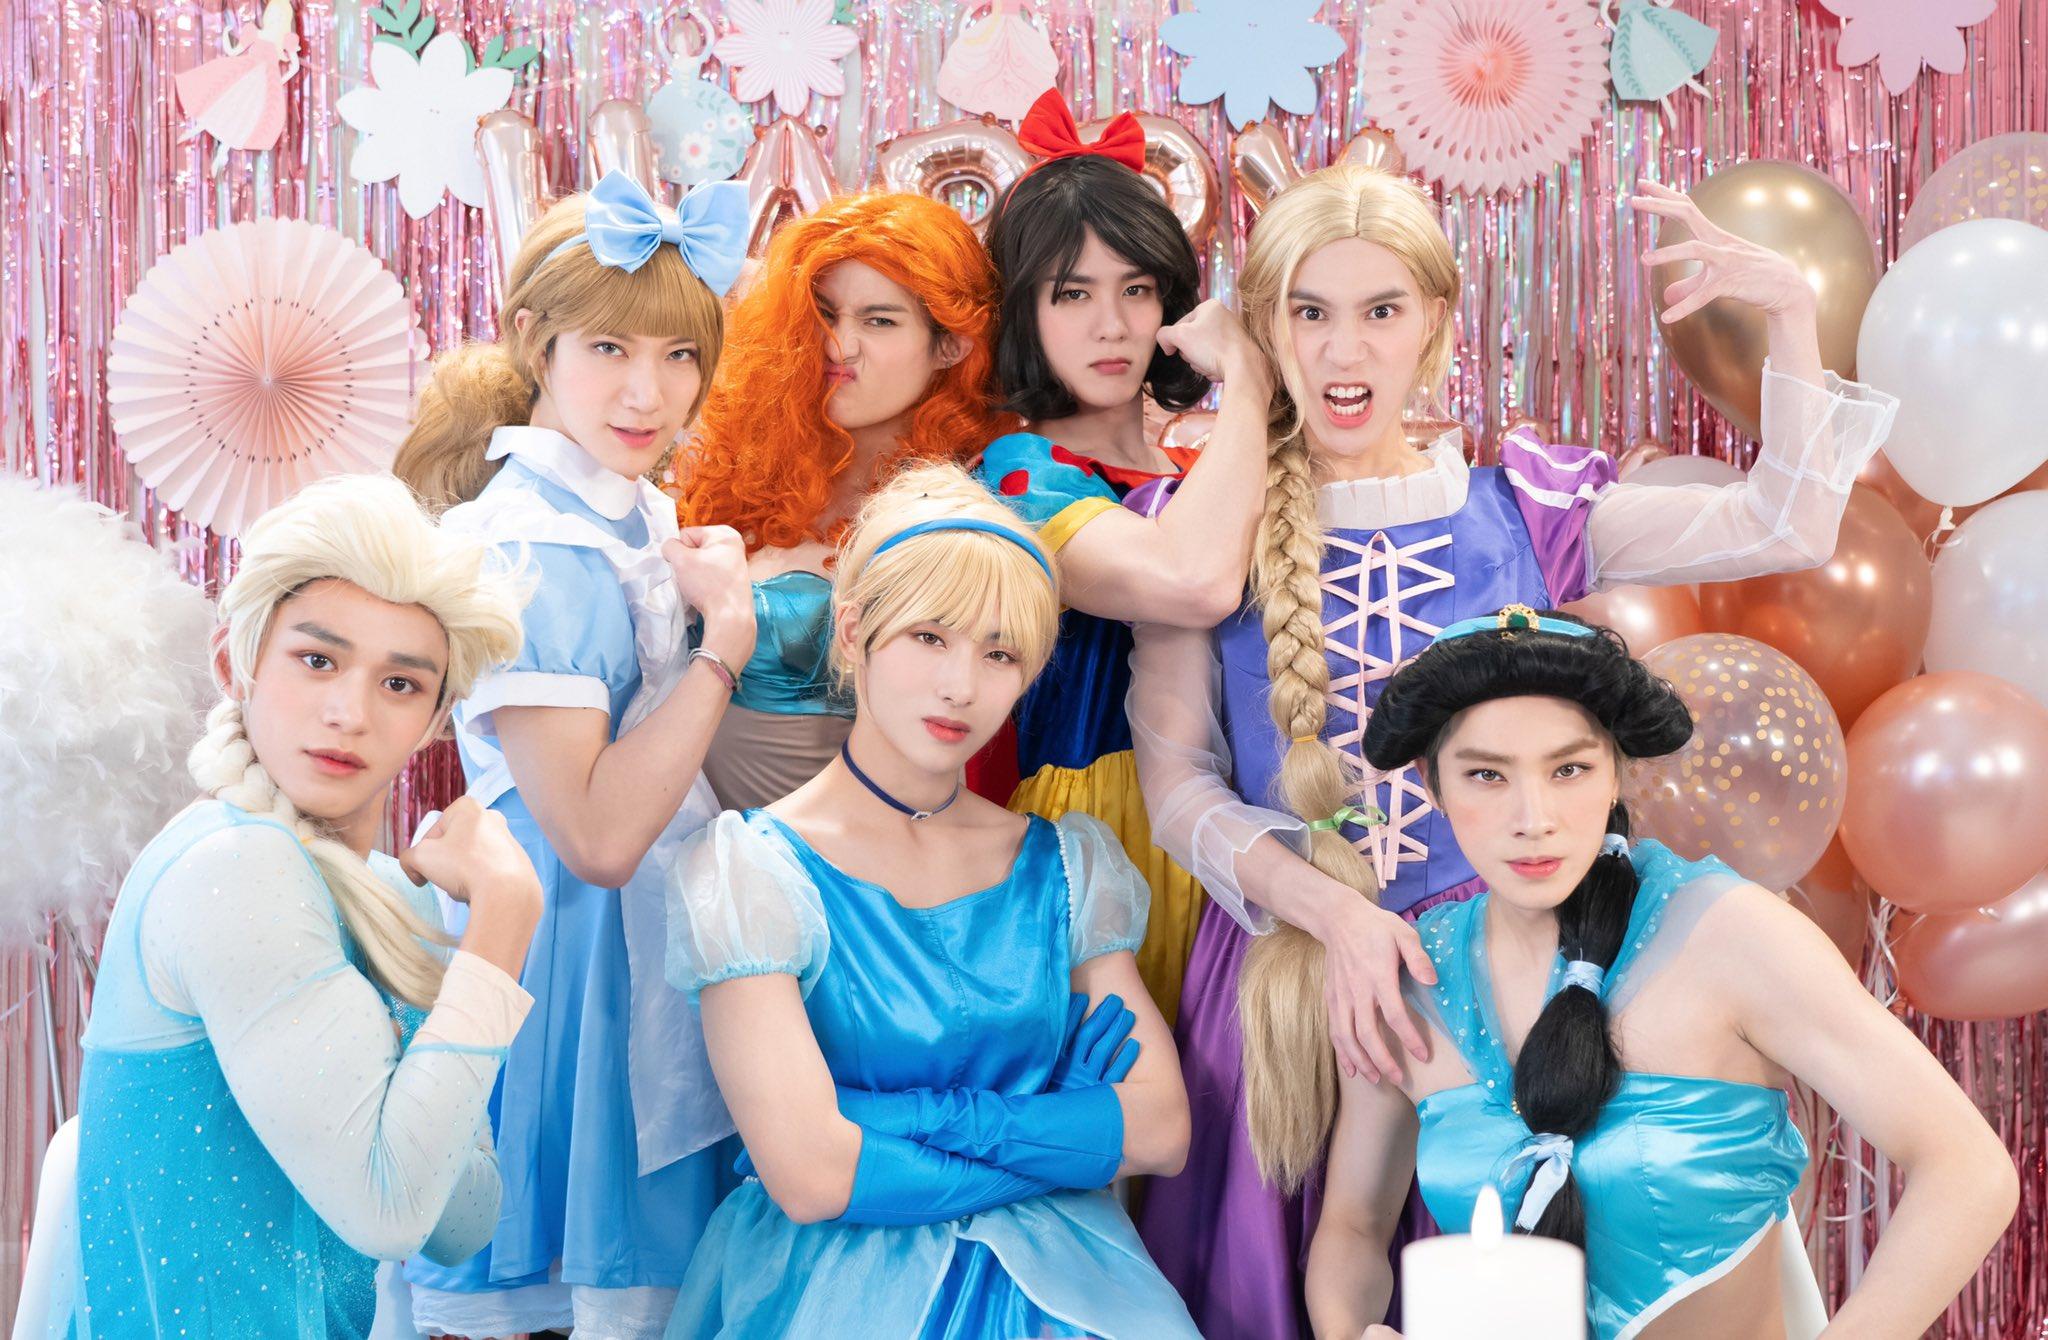 Wayv On Twitter Princess Party Photos Feat Wayv Wayv Weishenv Ũç¥žv